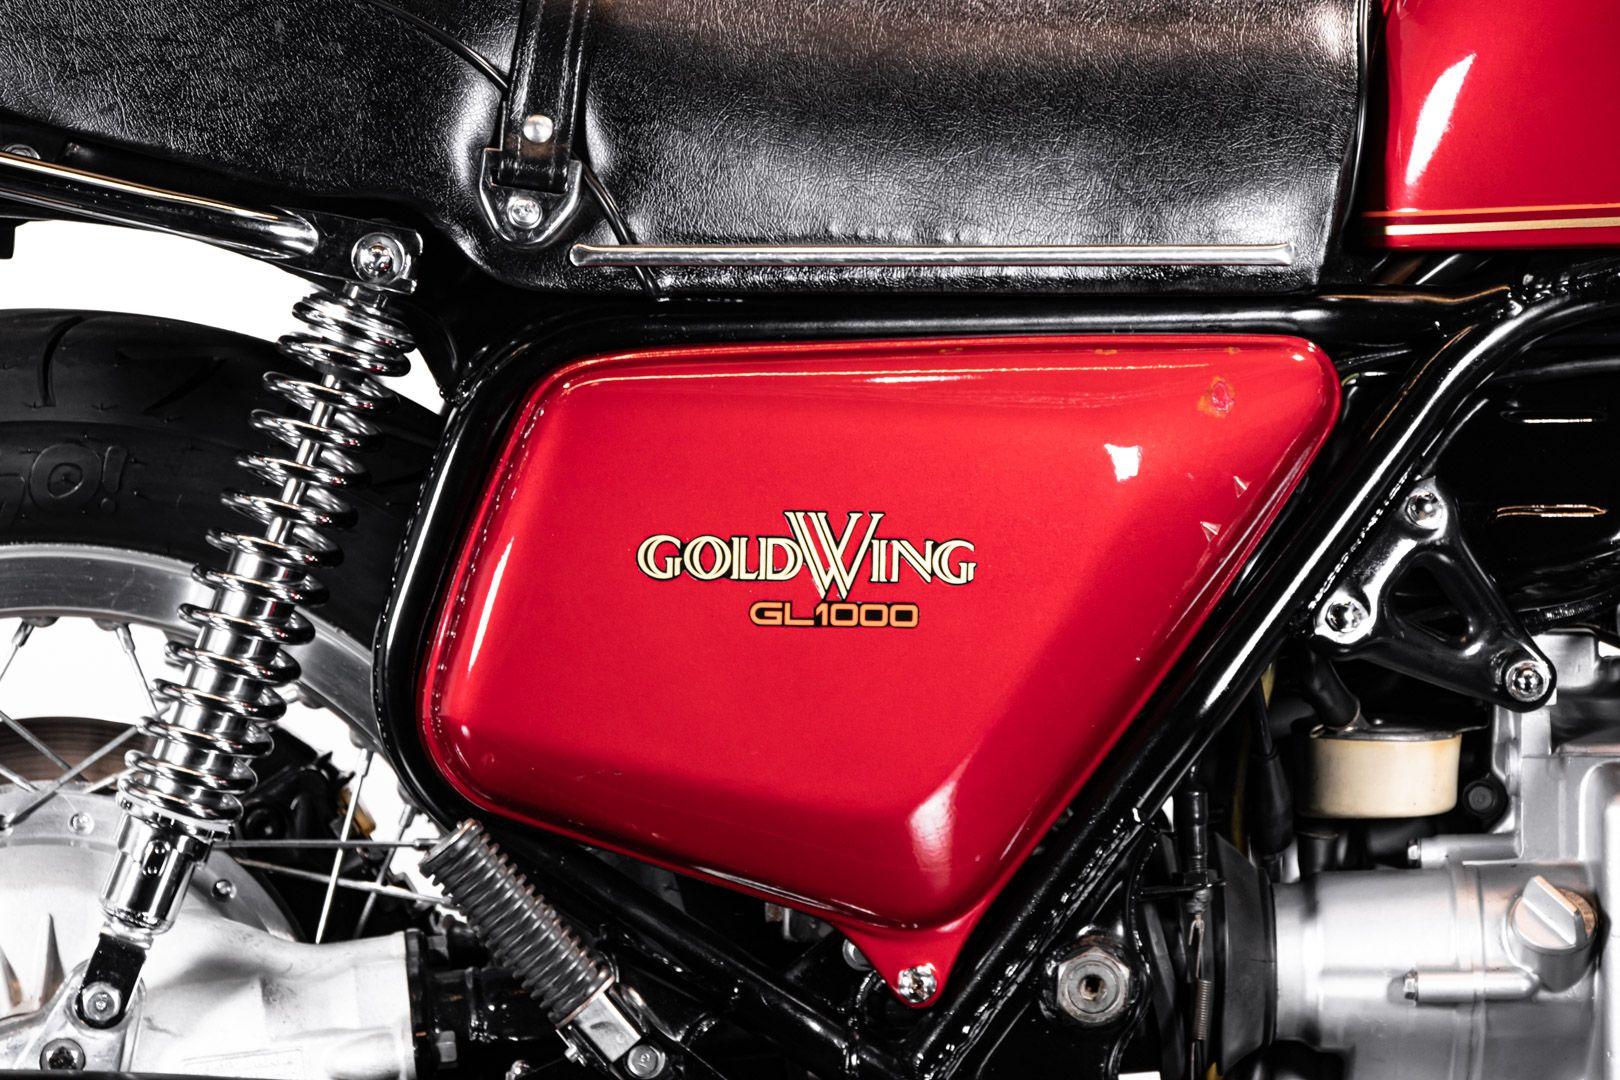 1976 Honda GL 1000 Goldwing 82876